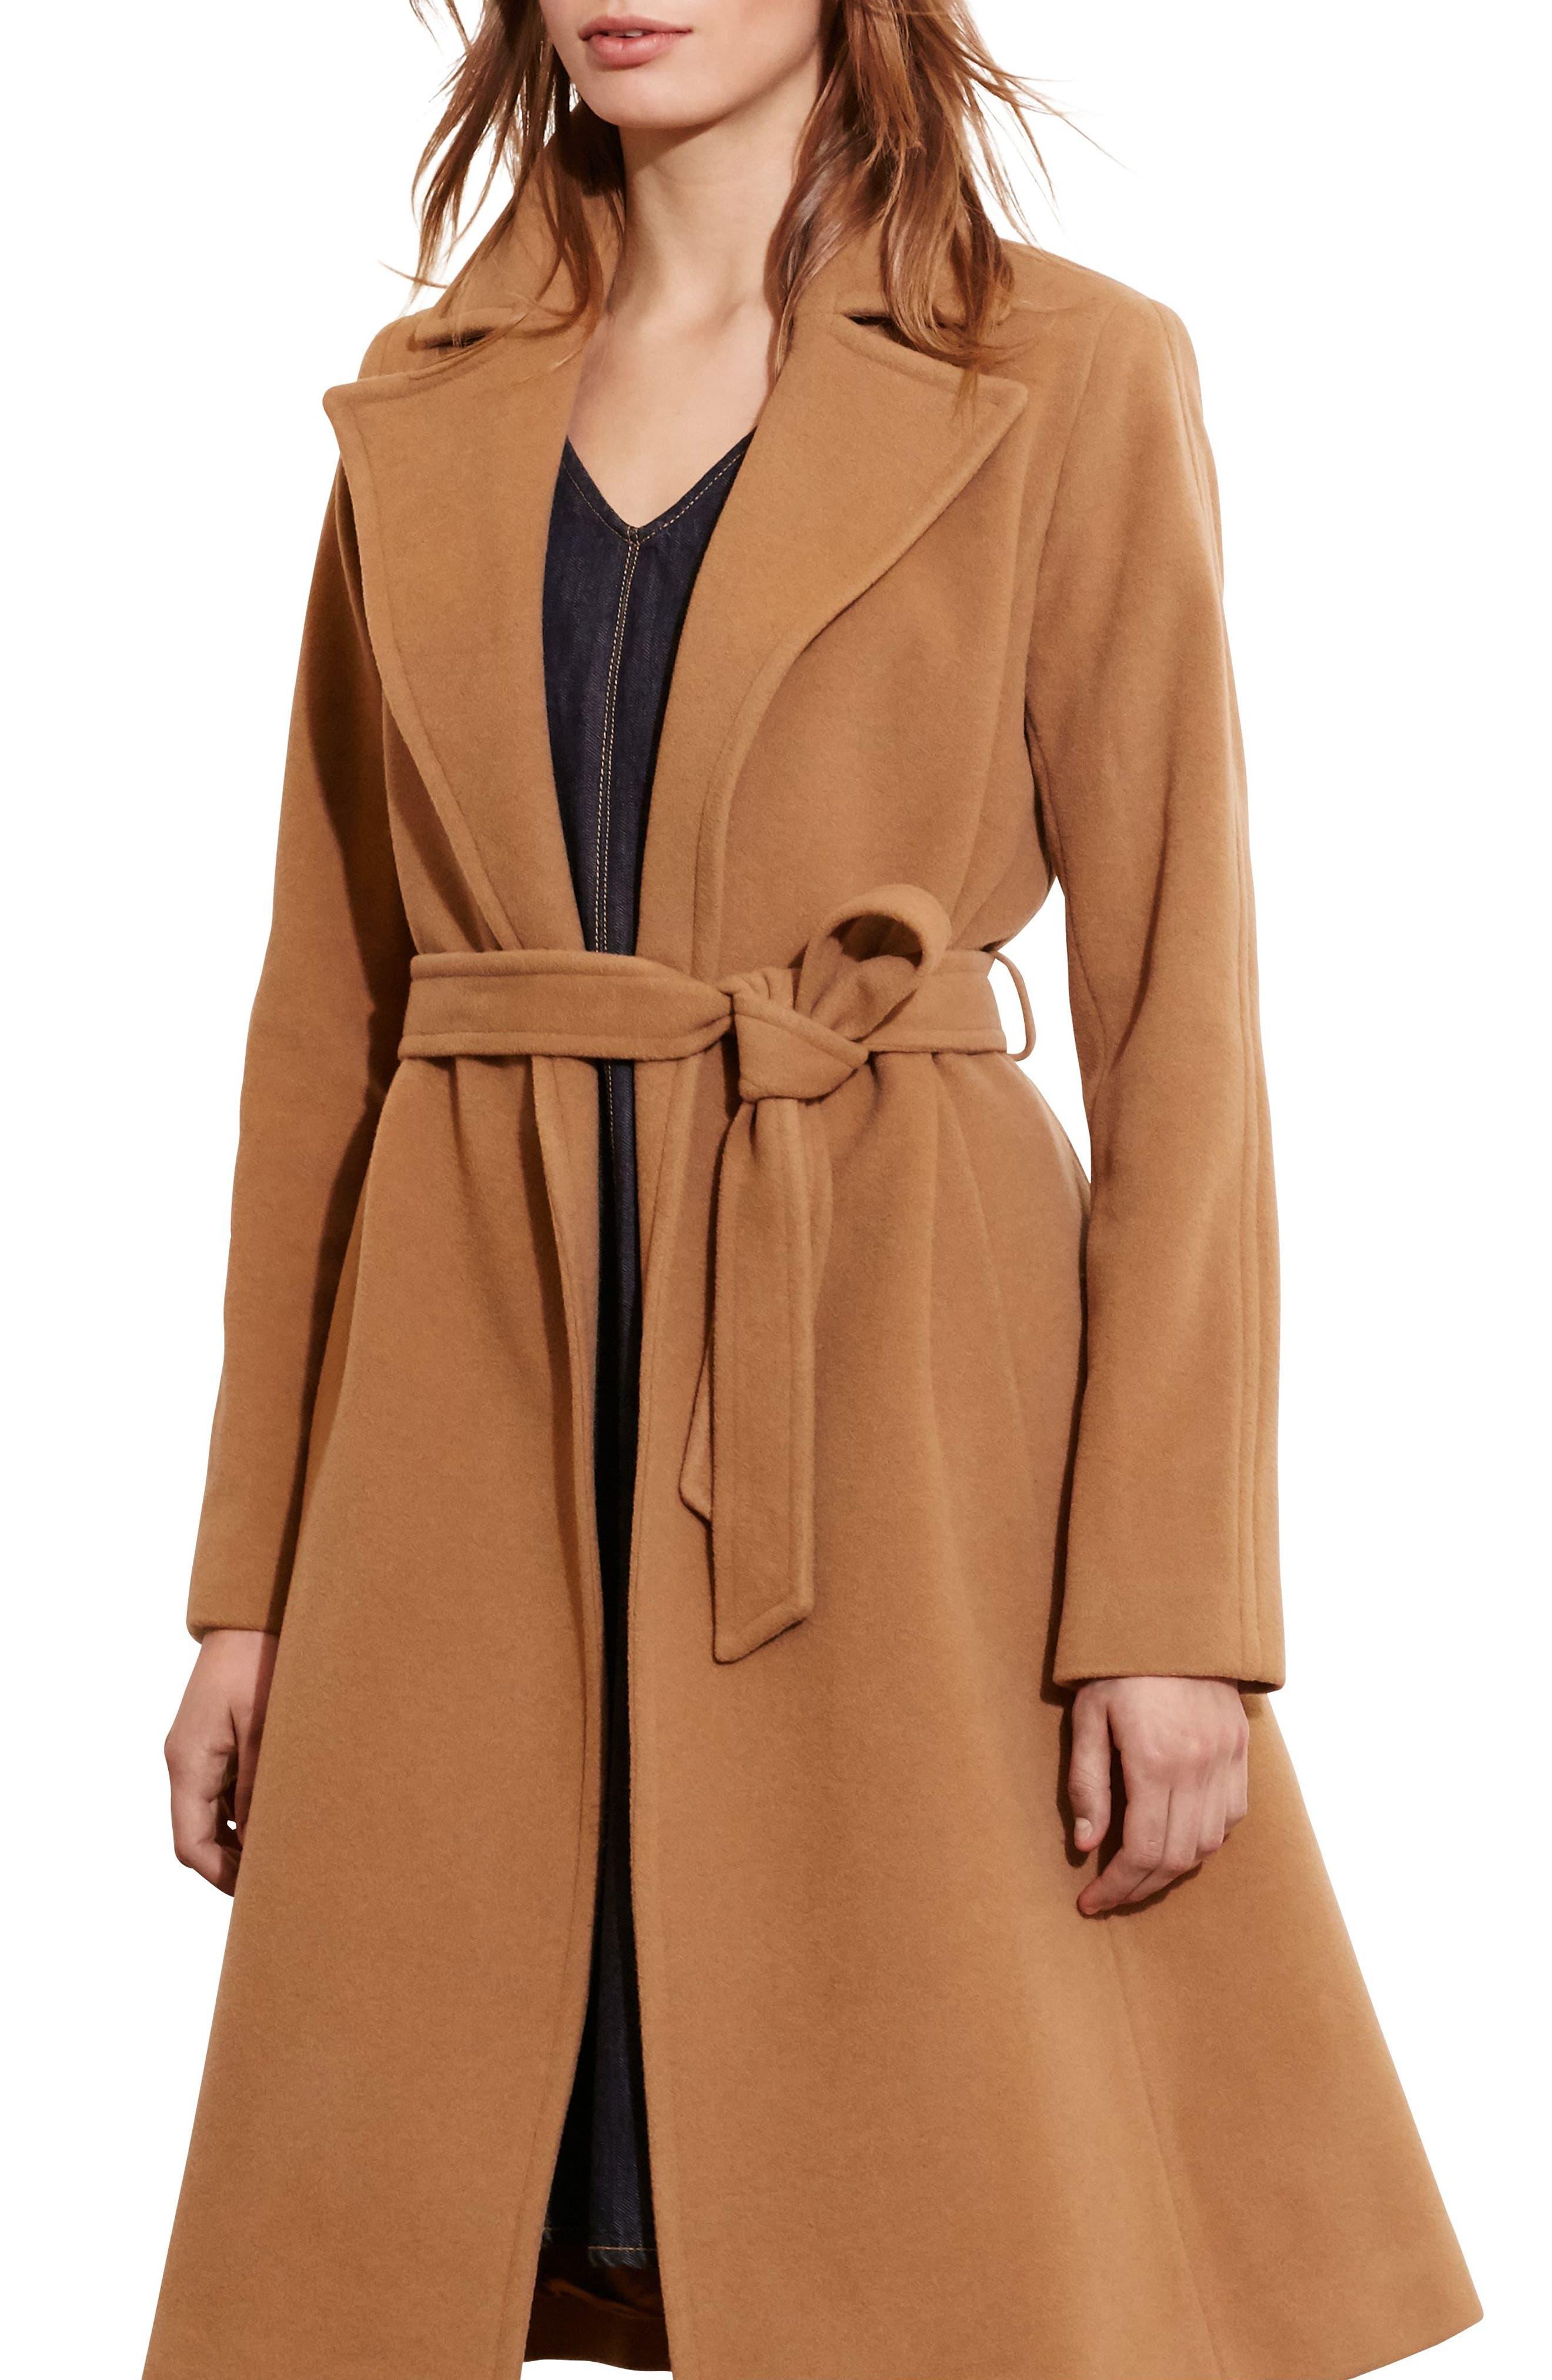 LAUREN RALPH LAUREN, Wool Blend Wrap Coat, Main thumbnail 1, color, 256